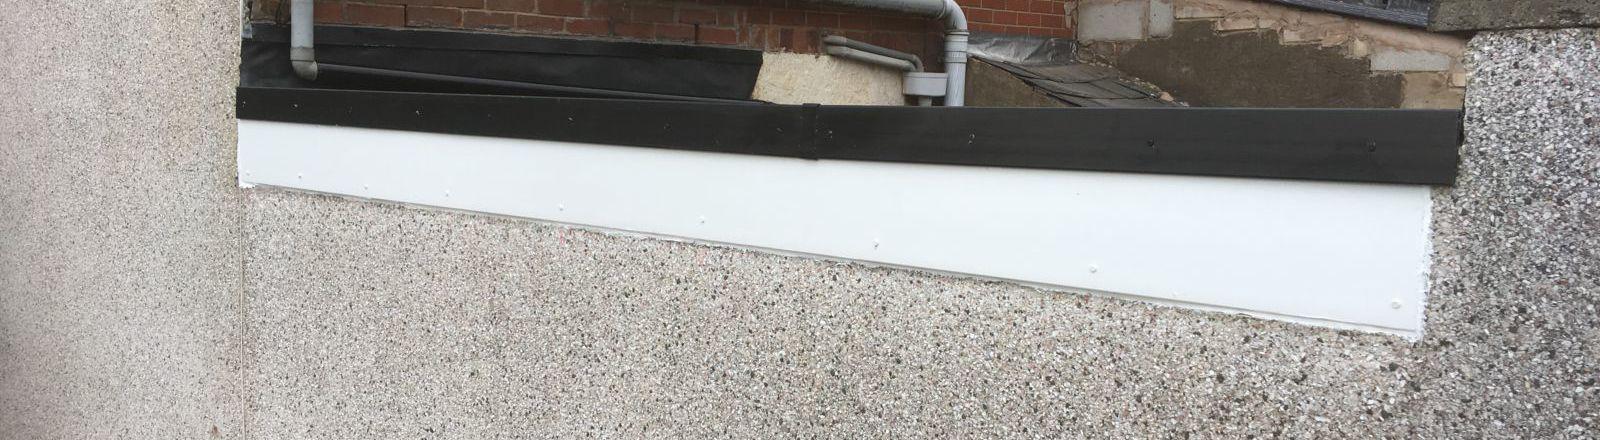 Ridgesmart Roofing Services